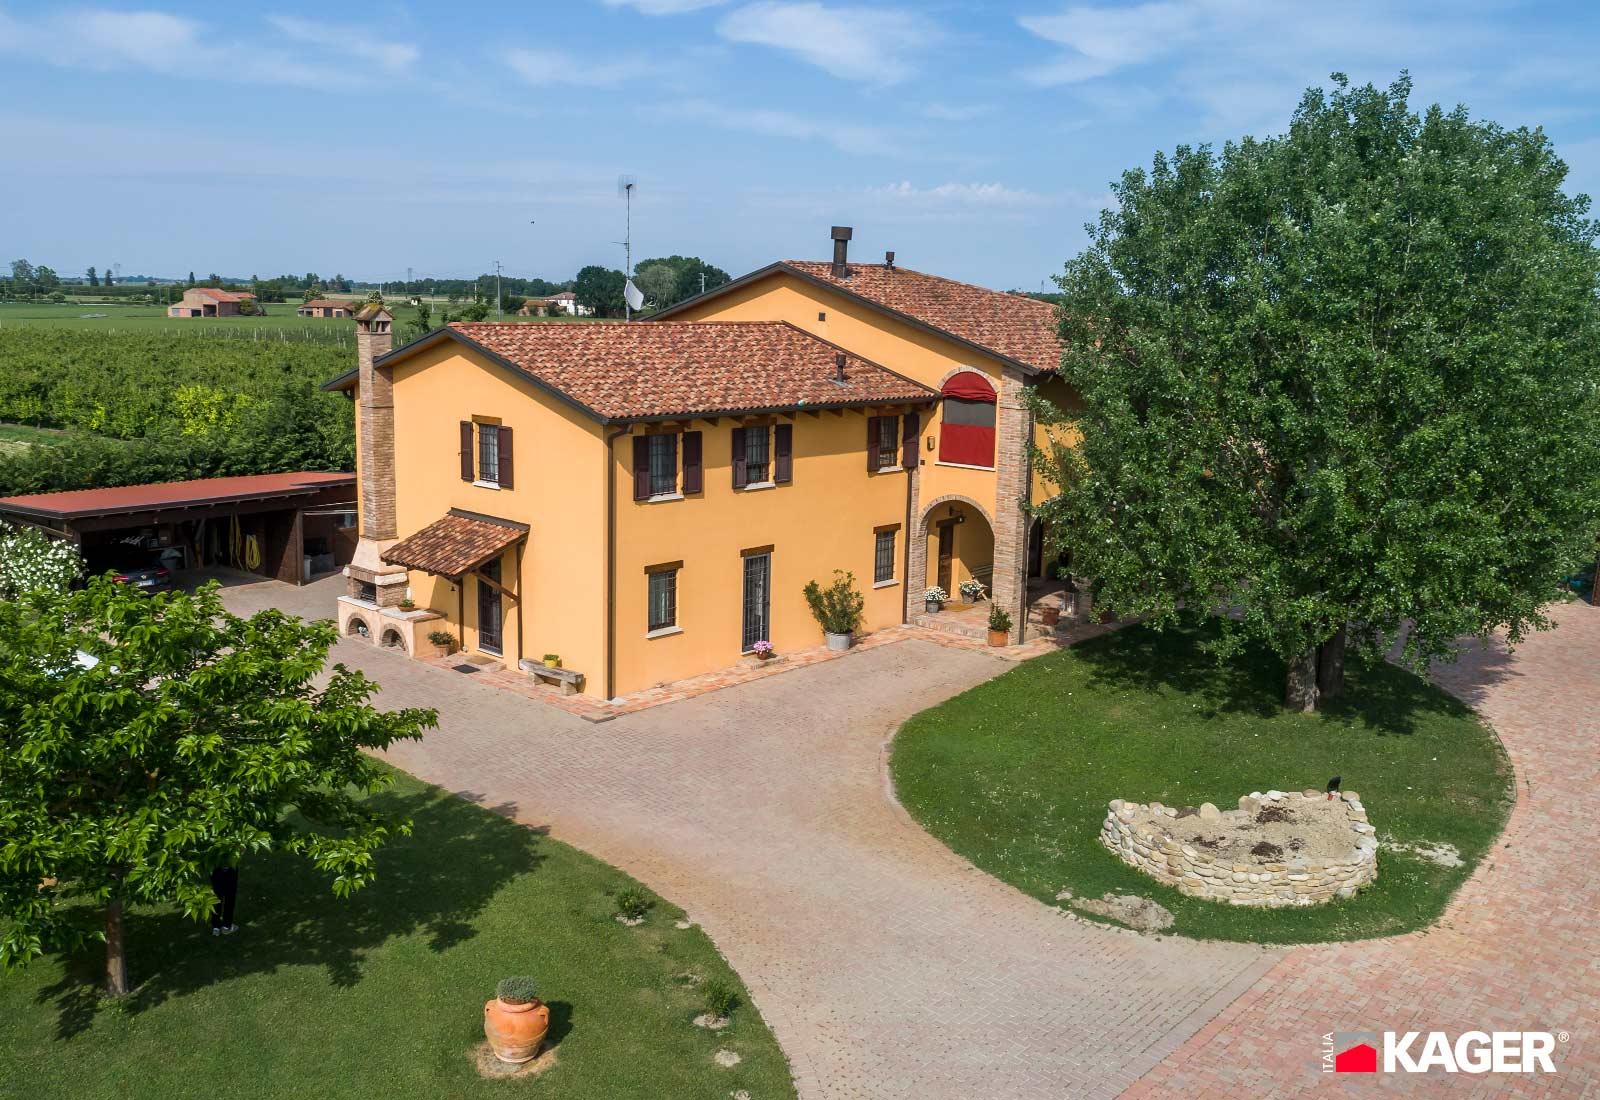 Casa-in-legno-Ferrara-Kager-Italia-01